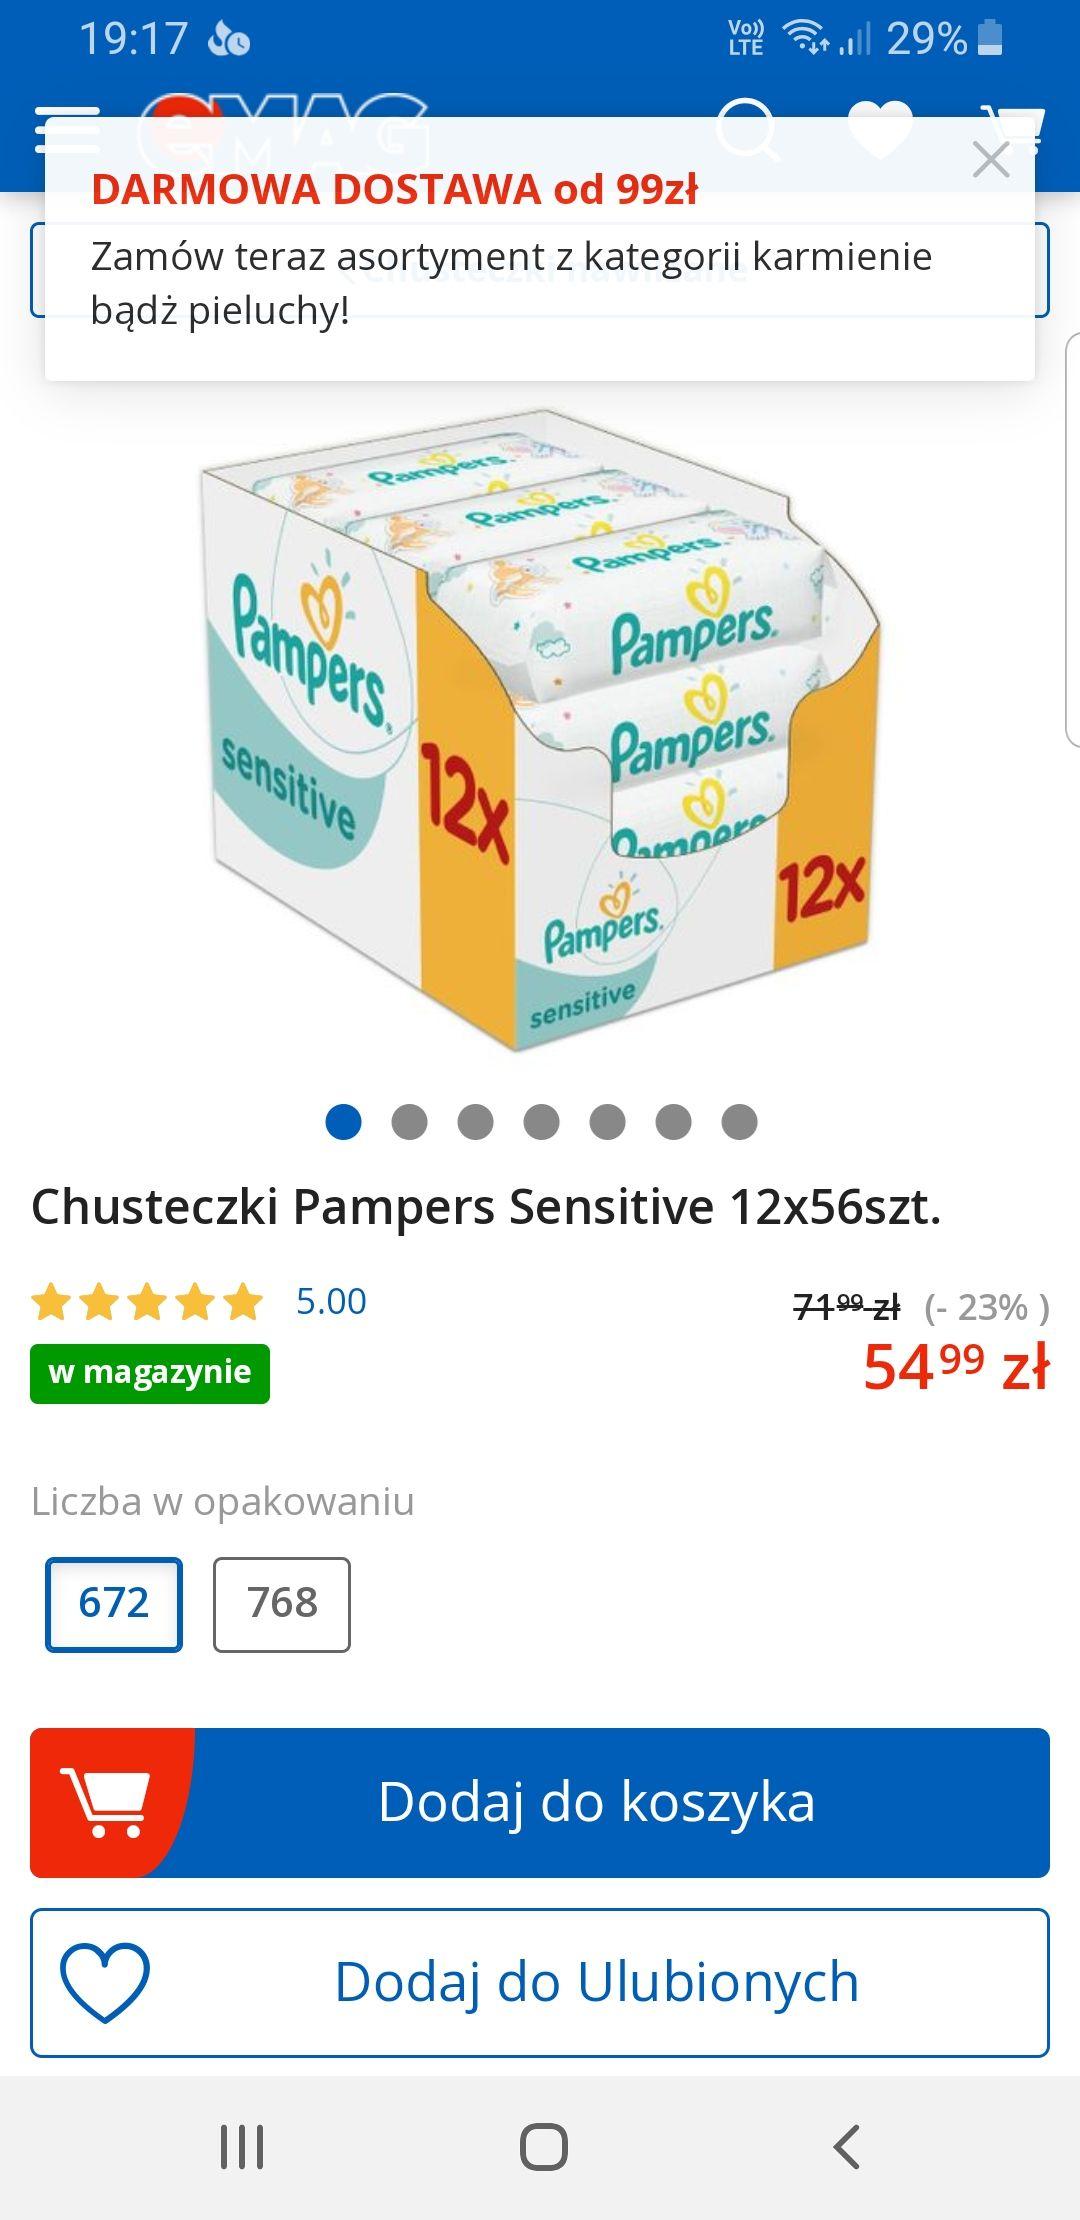 Chusteczki Pampers Sensitive 12x56